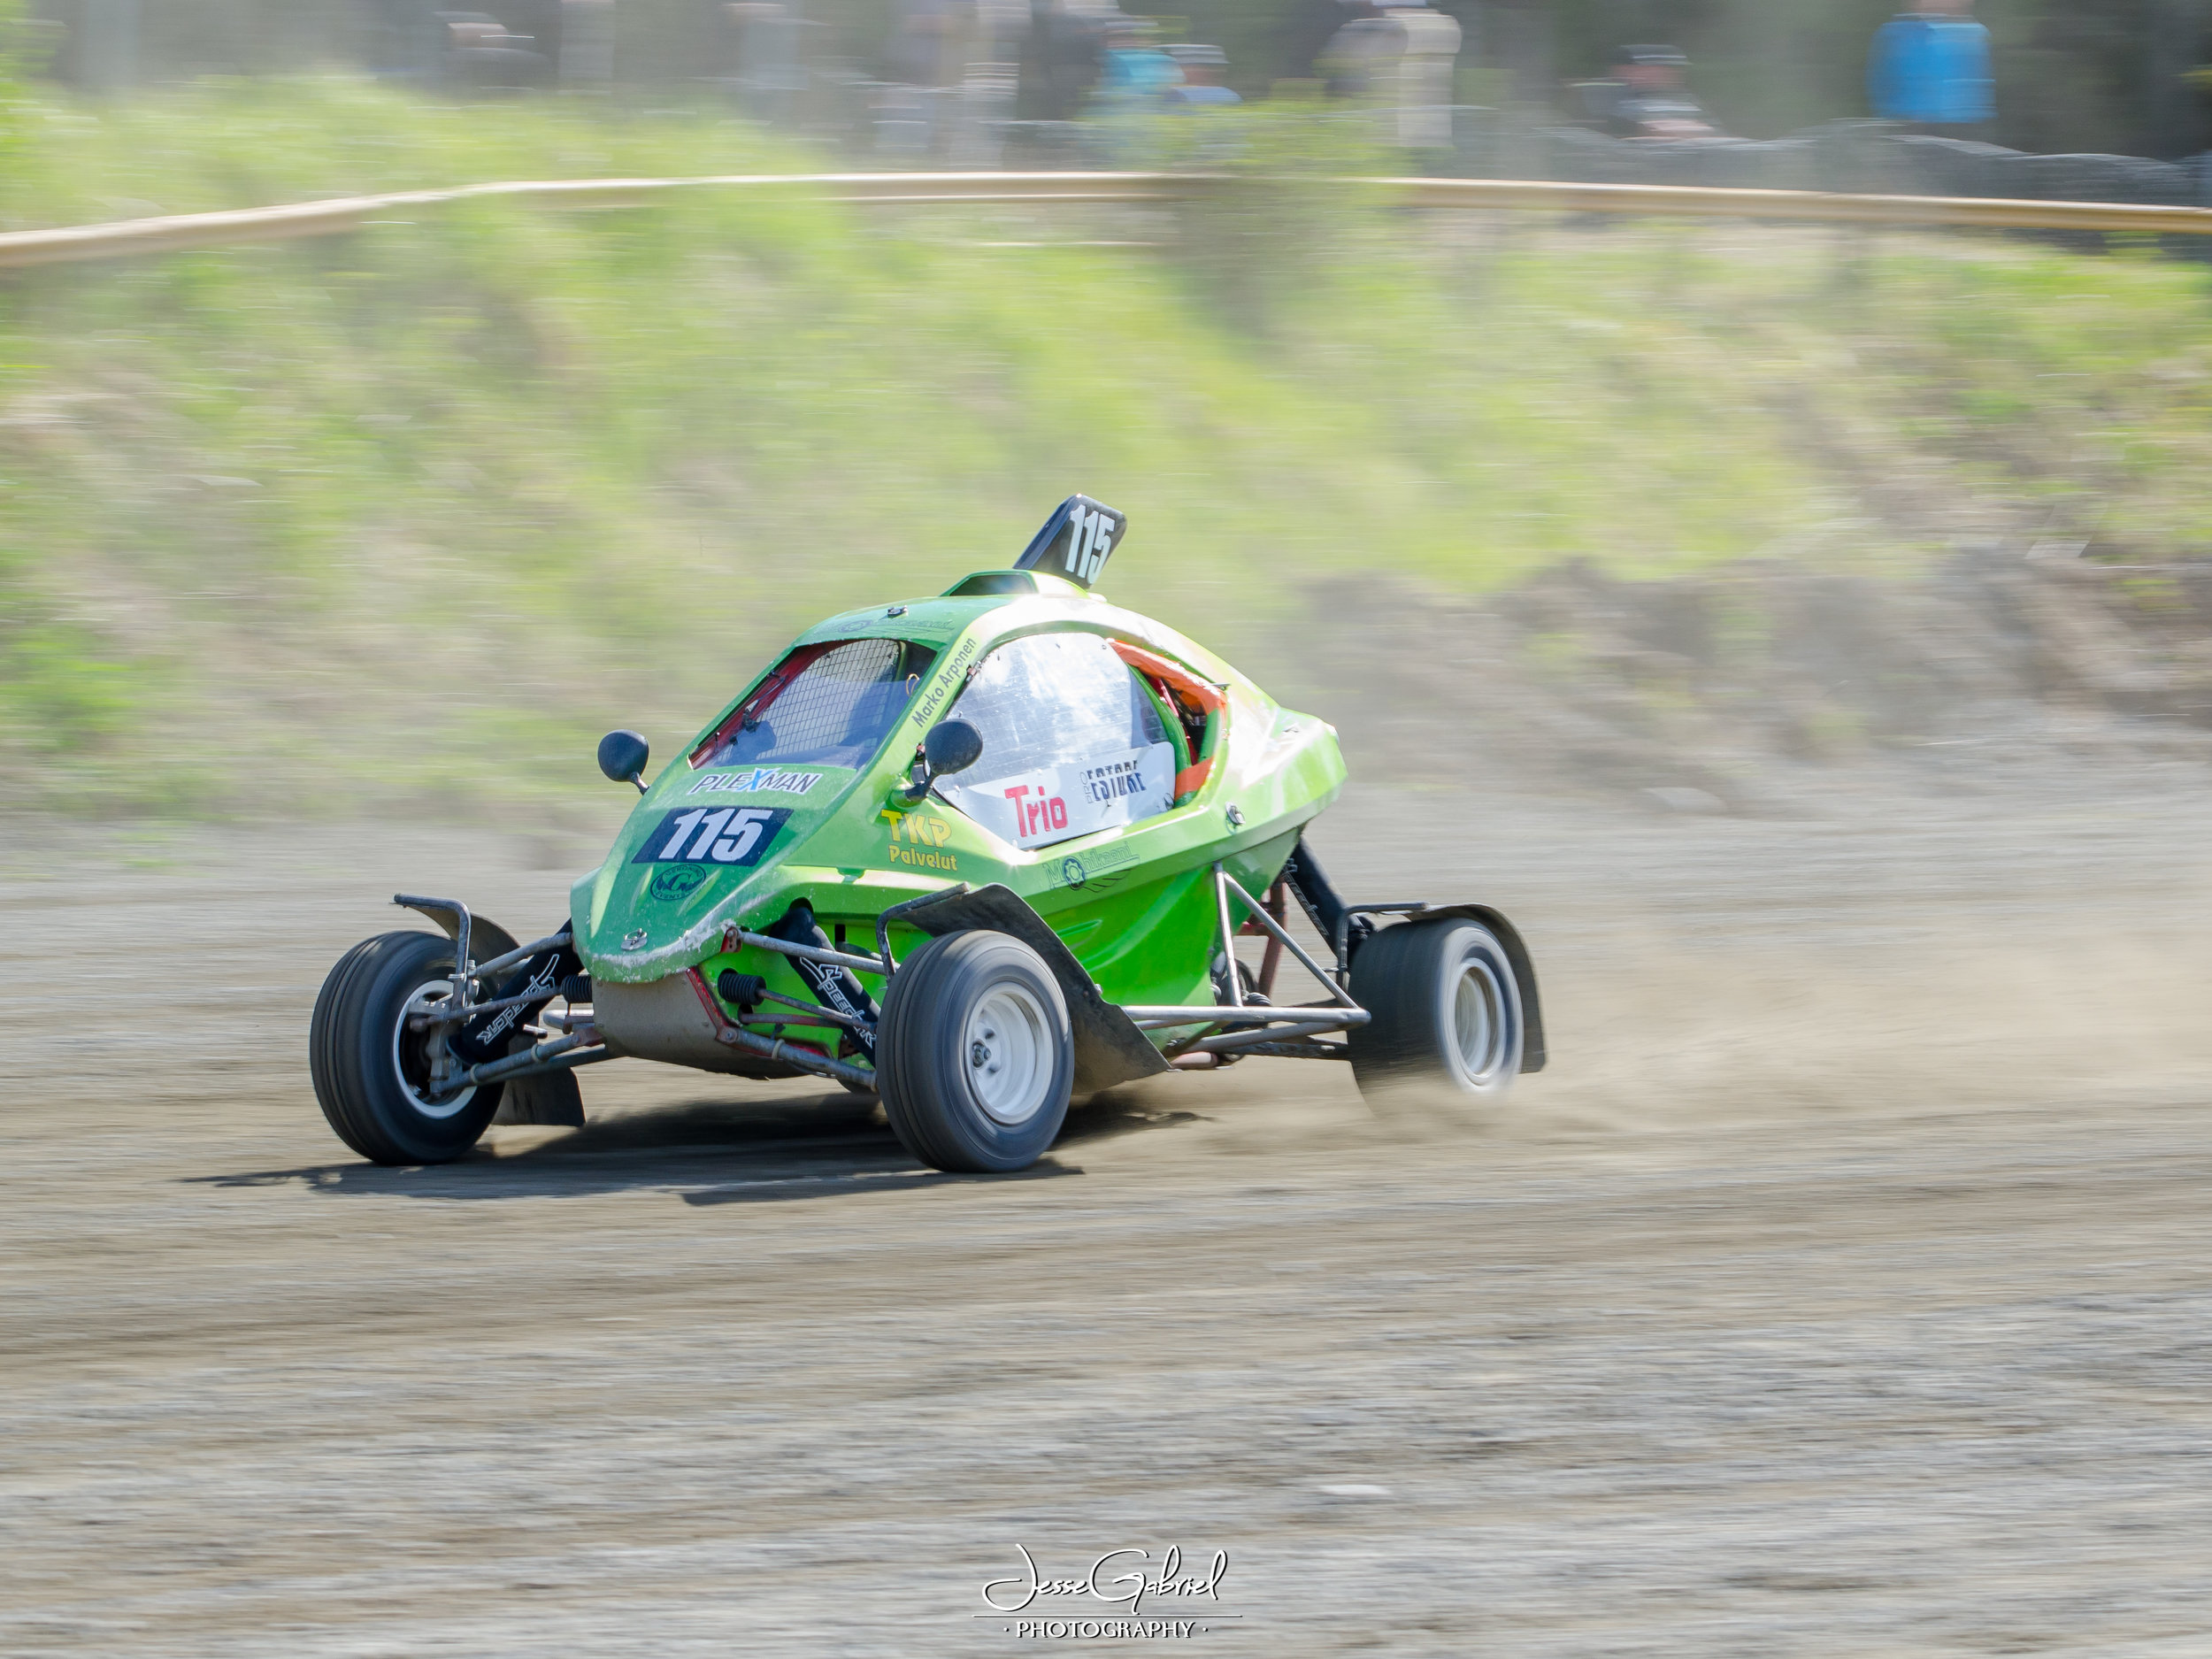 #115 Marko Arponen - Seura: HyuaAuto: Speedcar Xtrem / Suzuki